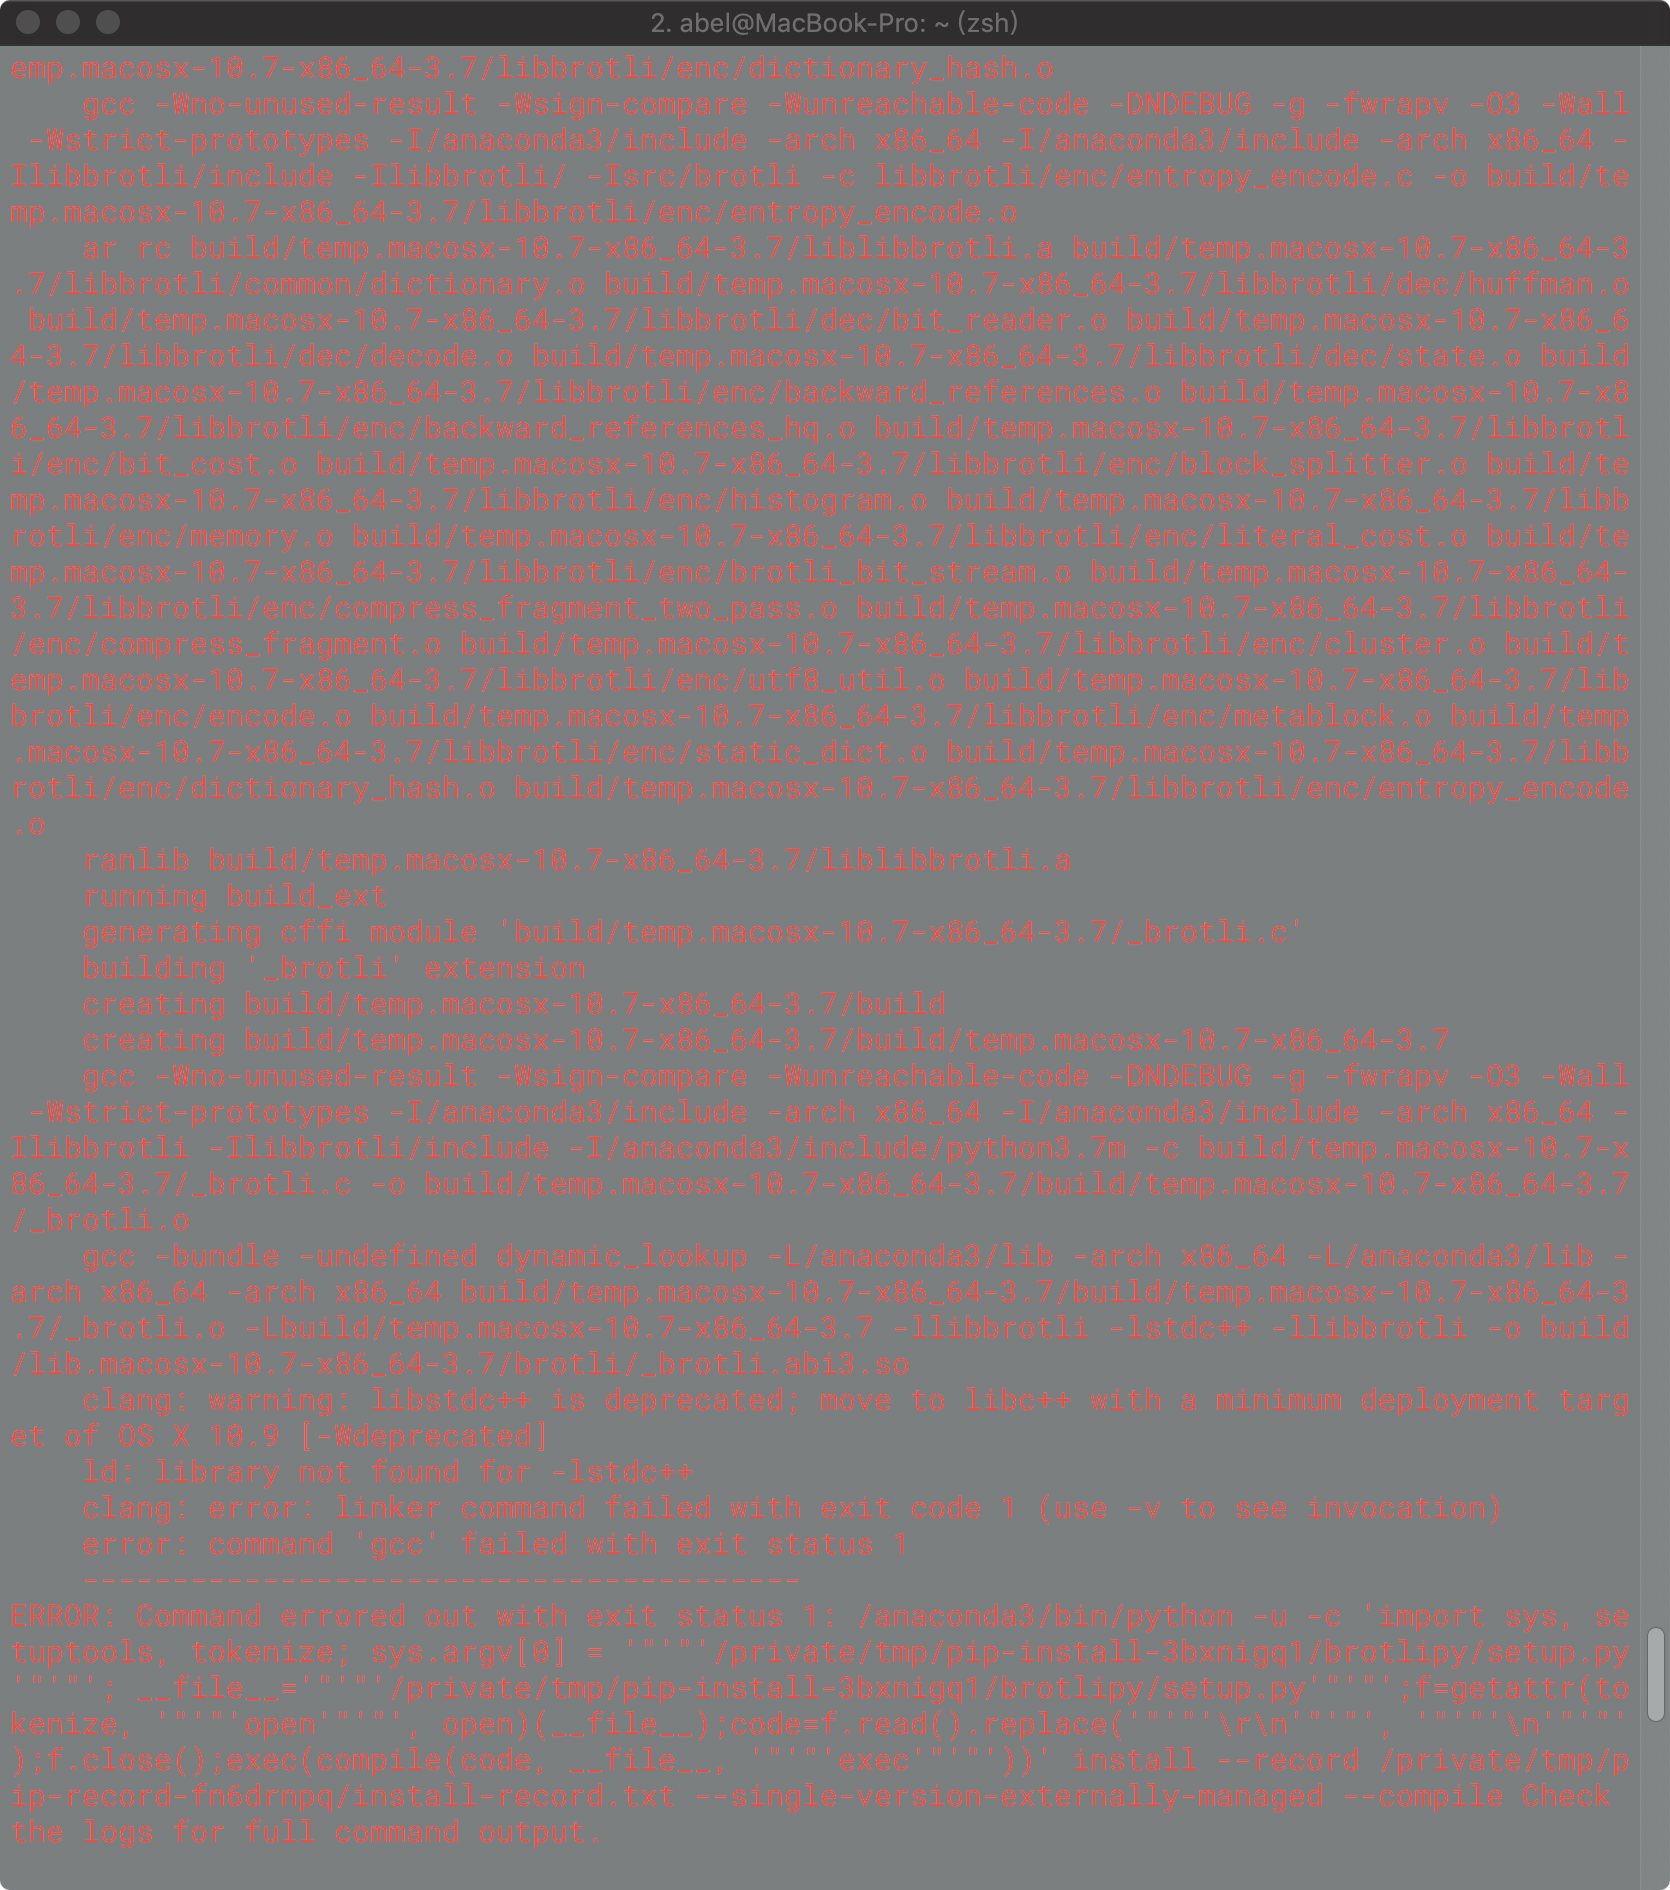 error: command 'gcc' failed with exit status 1 -Python3.7 MacOs Mojave